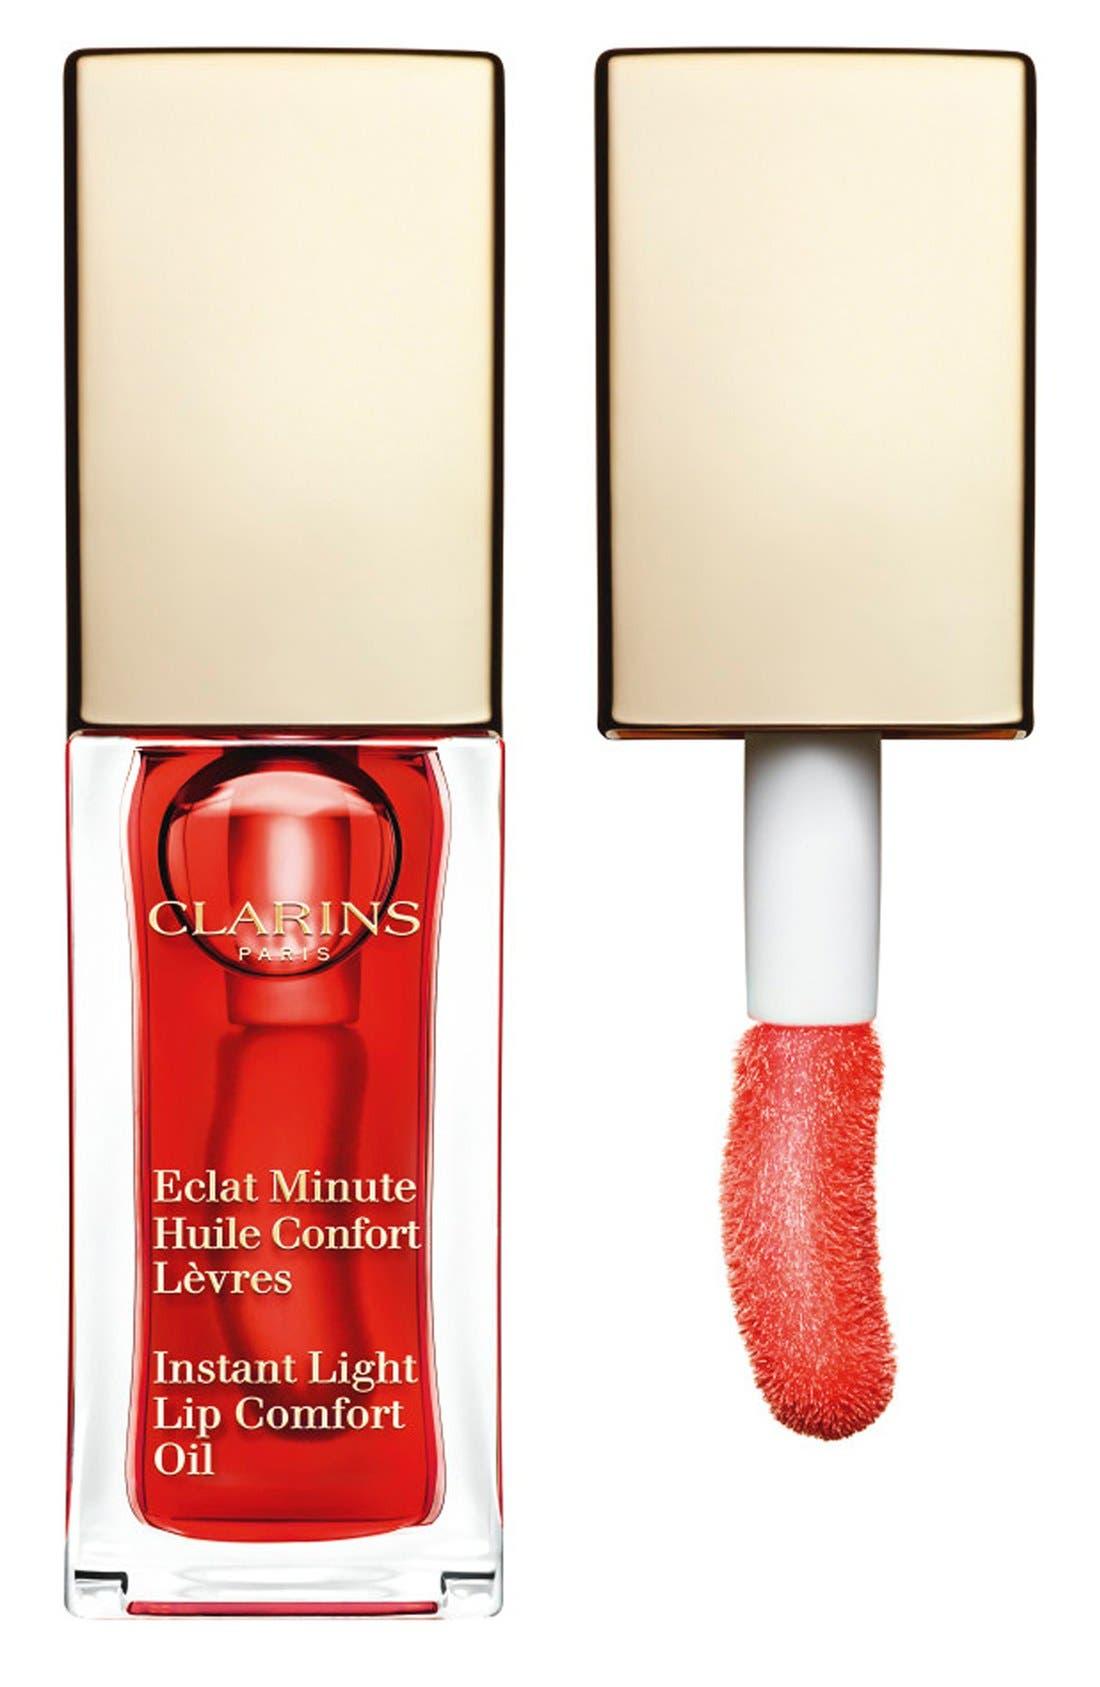 Clarins 'Instant Light' Lip Comfort Oil